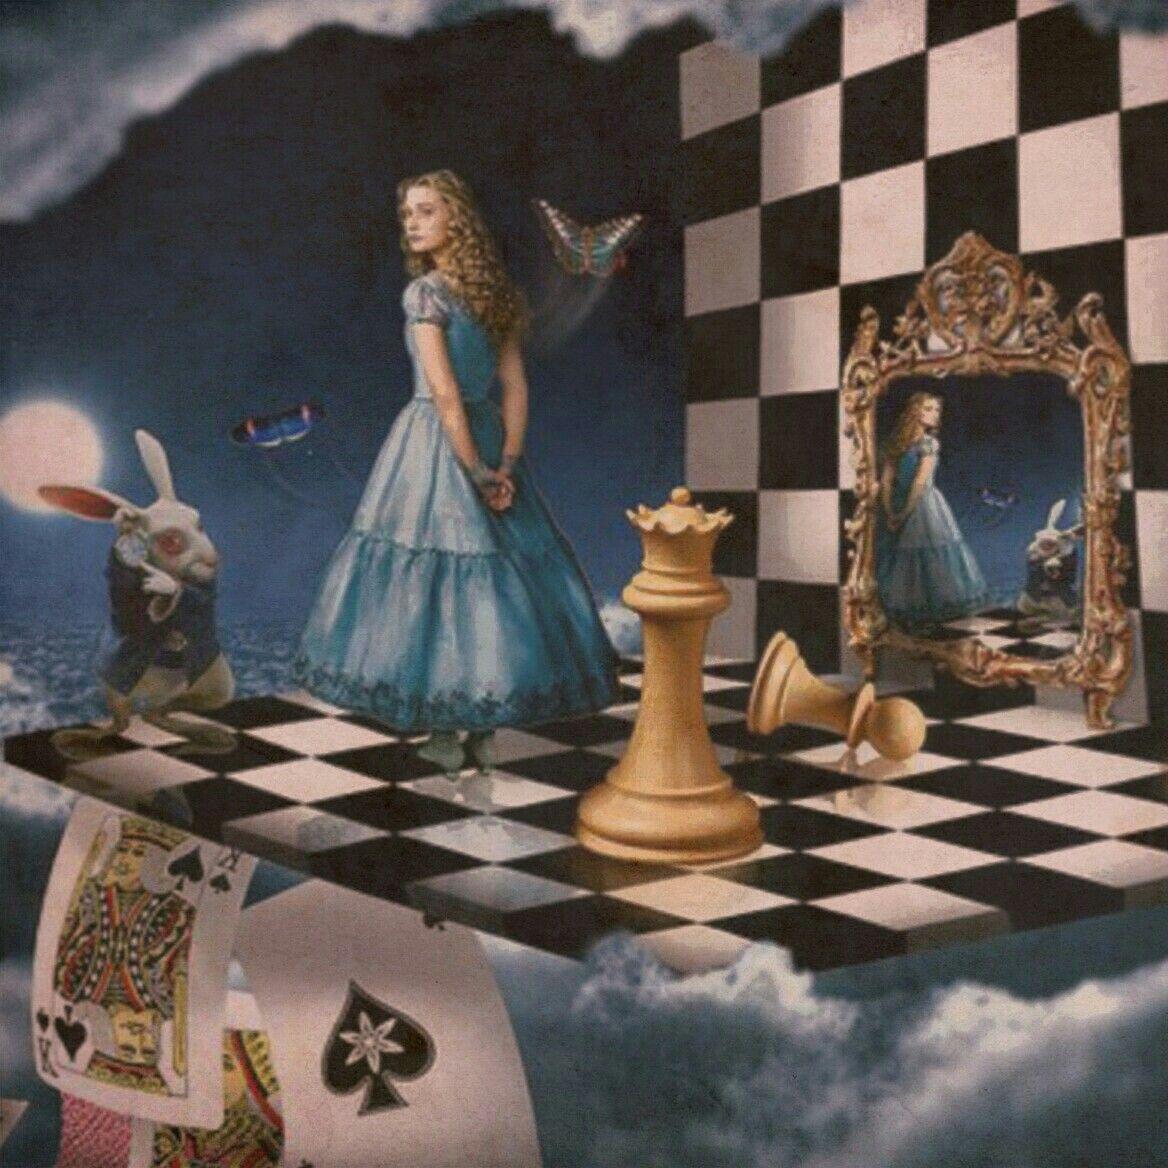 Alice in Wonderland | Alice in wonderland, Surreal art, Art